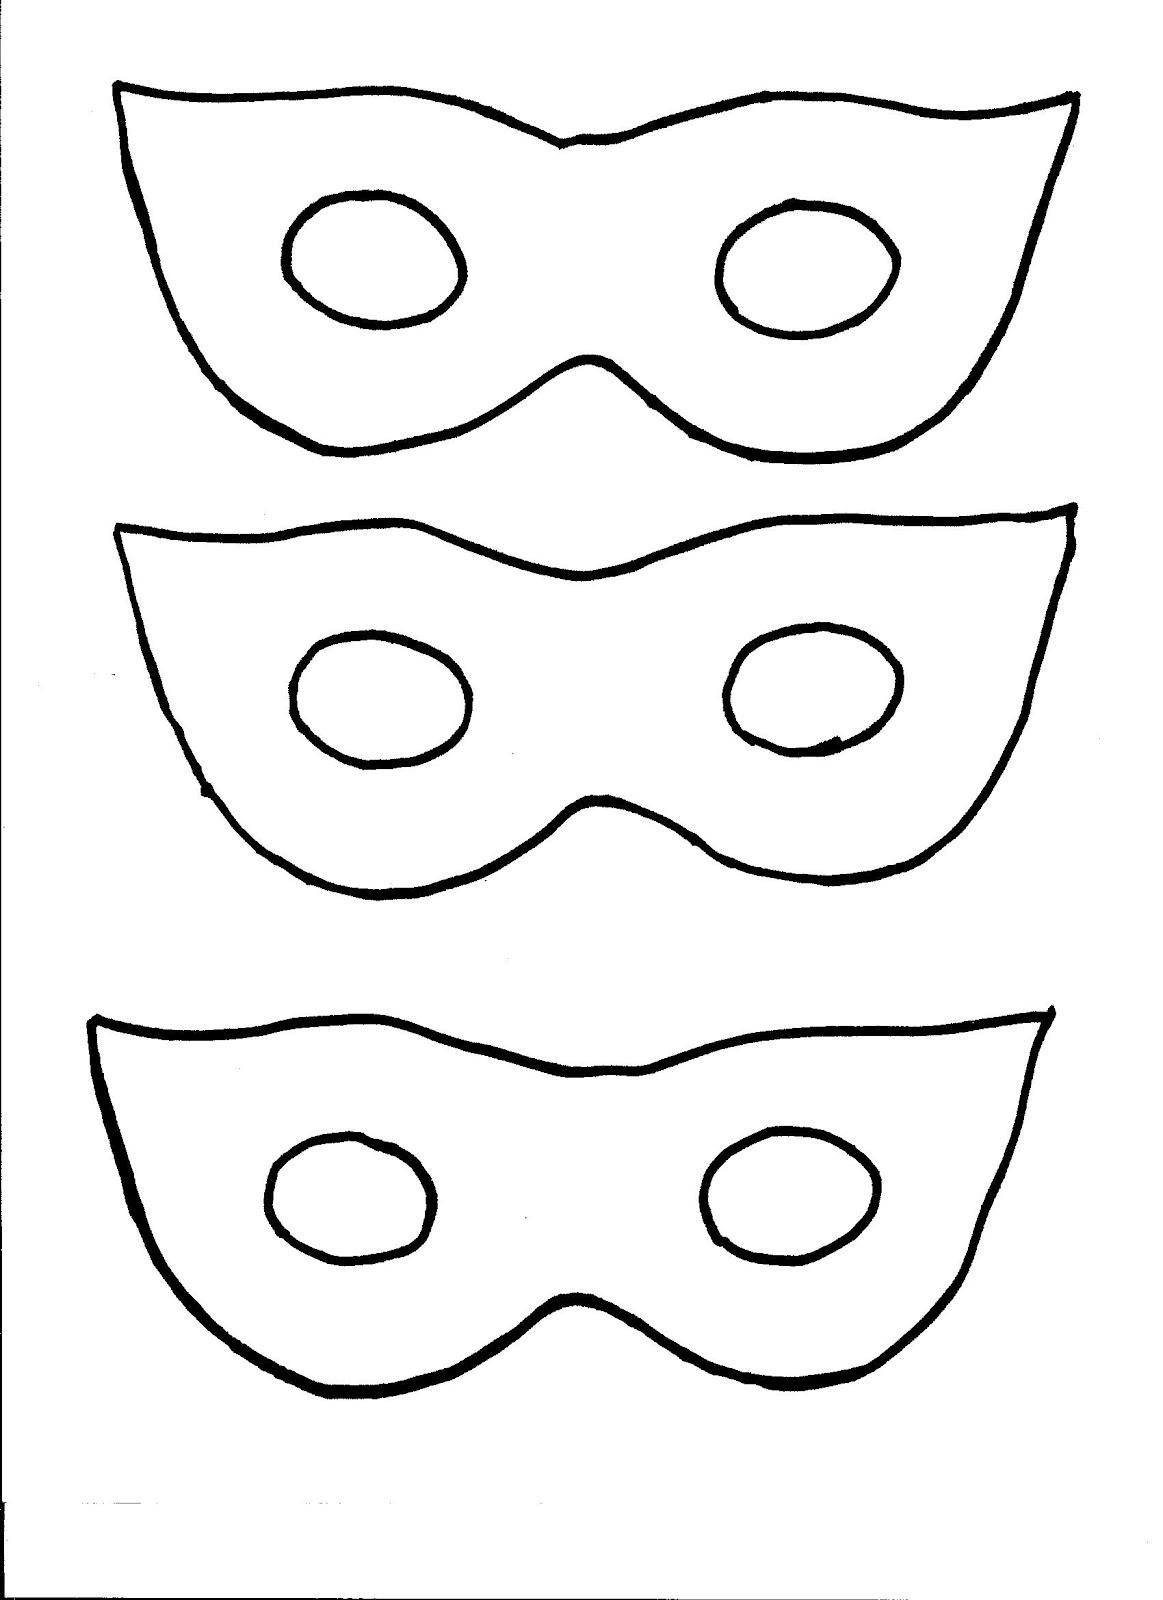 Free Mask Templates, Download Free Clip Art, Free Clip Art On - Free Printable Superhero Masks